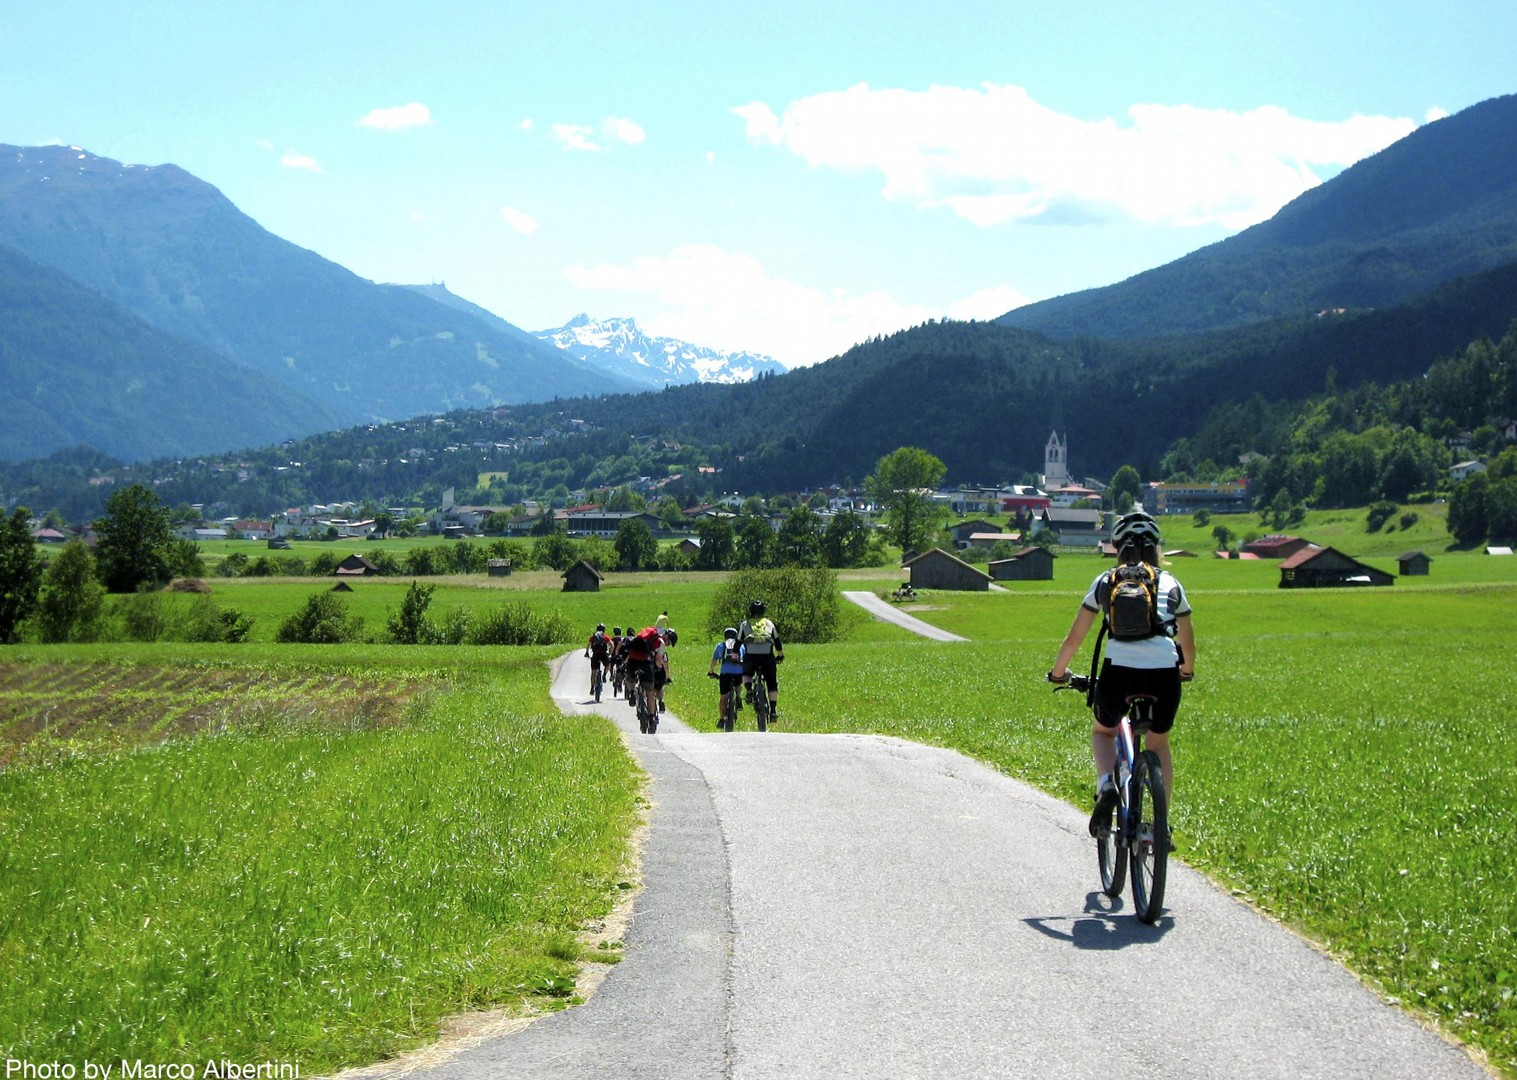 idylic-scenery-self-guided-cycling-adventure.jpg - Austria and Italy - La Via Claudia - Guided Leisure Cycling Holiday - Leisure Cycling